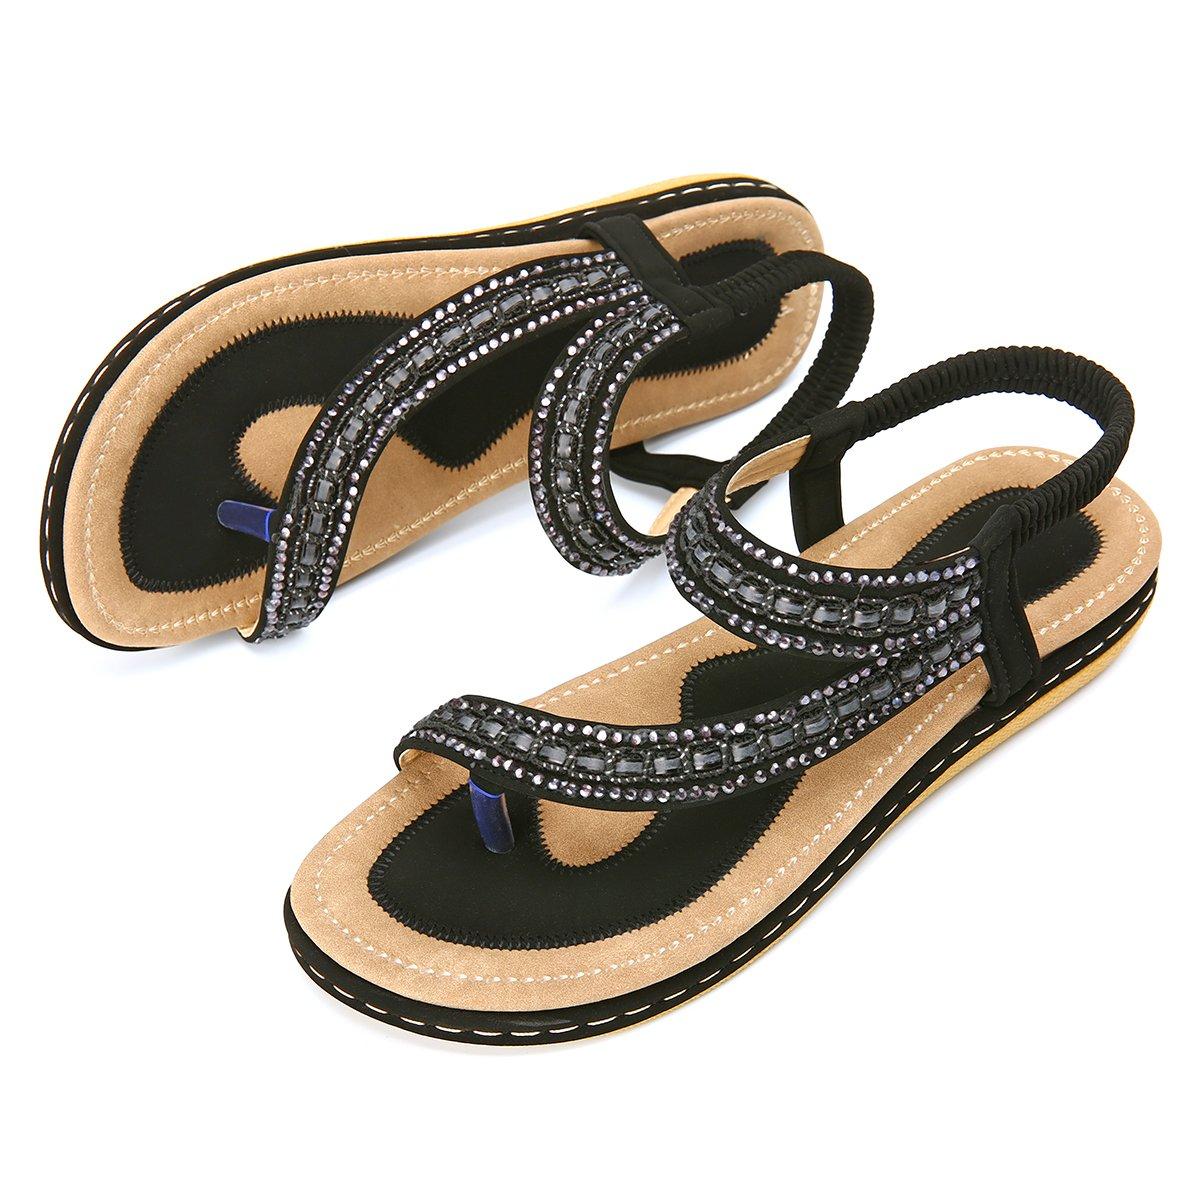 Women's Summer Flat Sandals Bohemian Rhinestone Outdoor Casual Flip Flops Beach Thong Anti-Slip Shoes Black 8 B(M) US